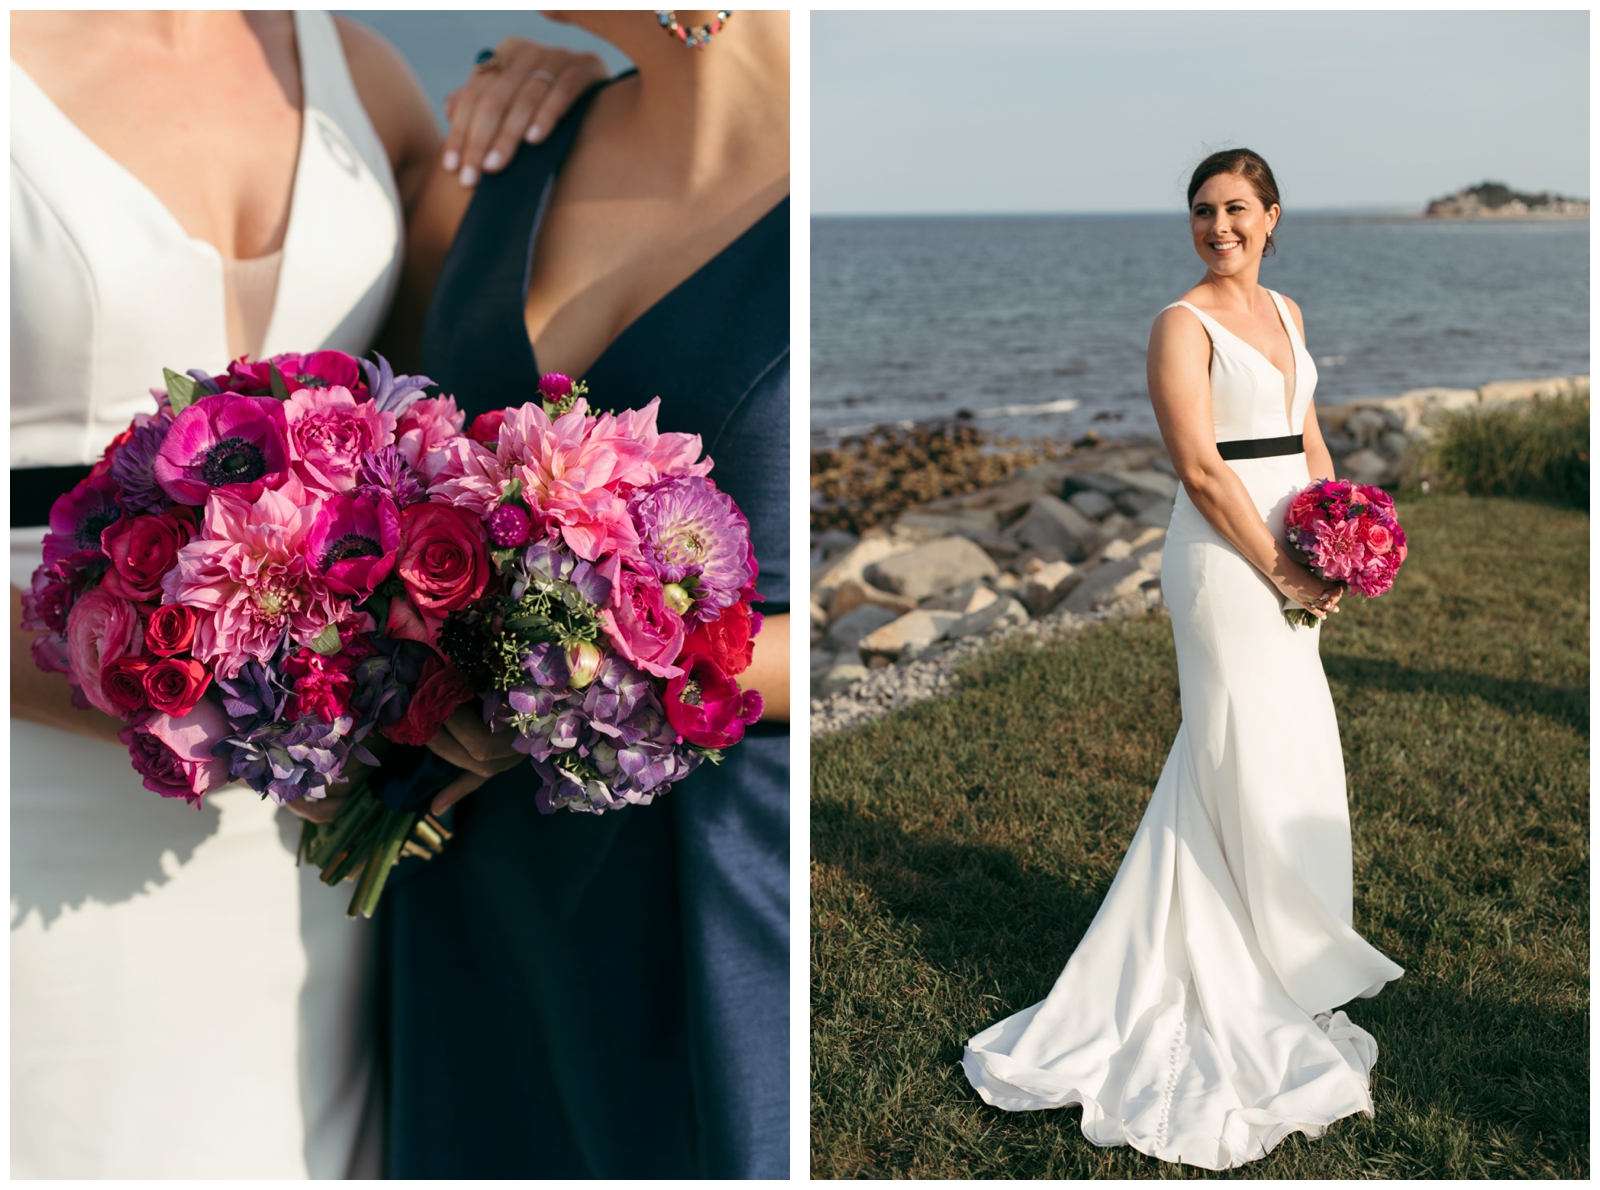 Bailey-Q-Photo-Backyard-Wedding-South-Shore-Boston-Wedding-Photographer-070.jpg